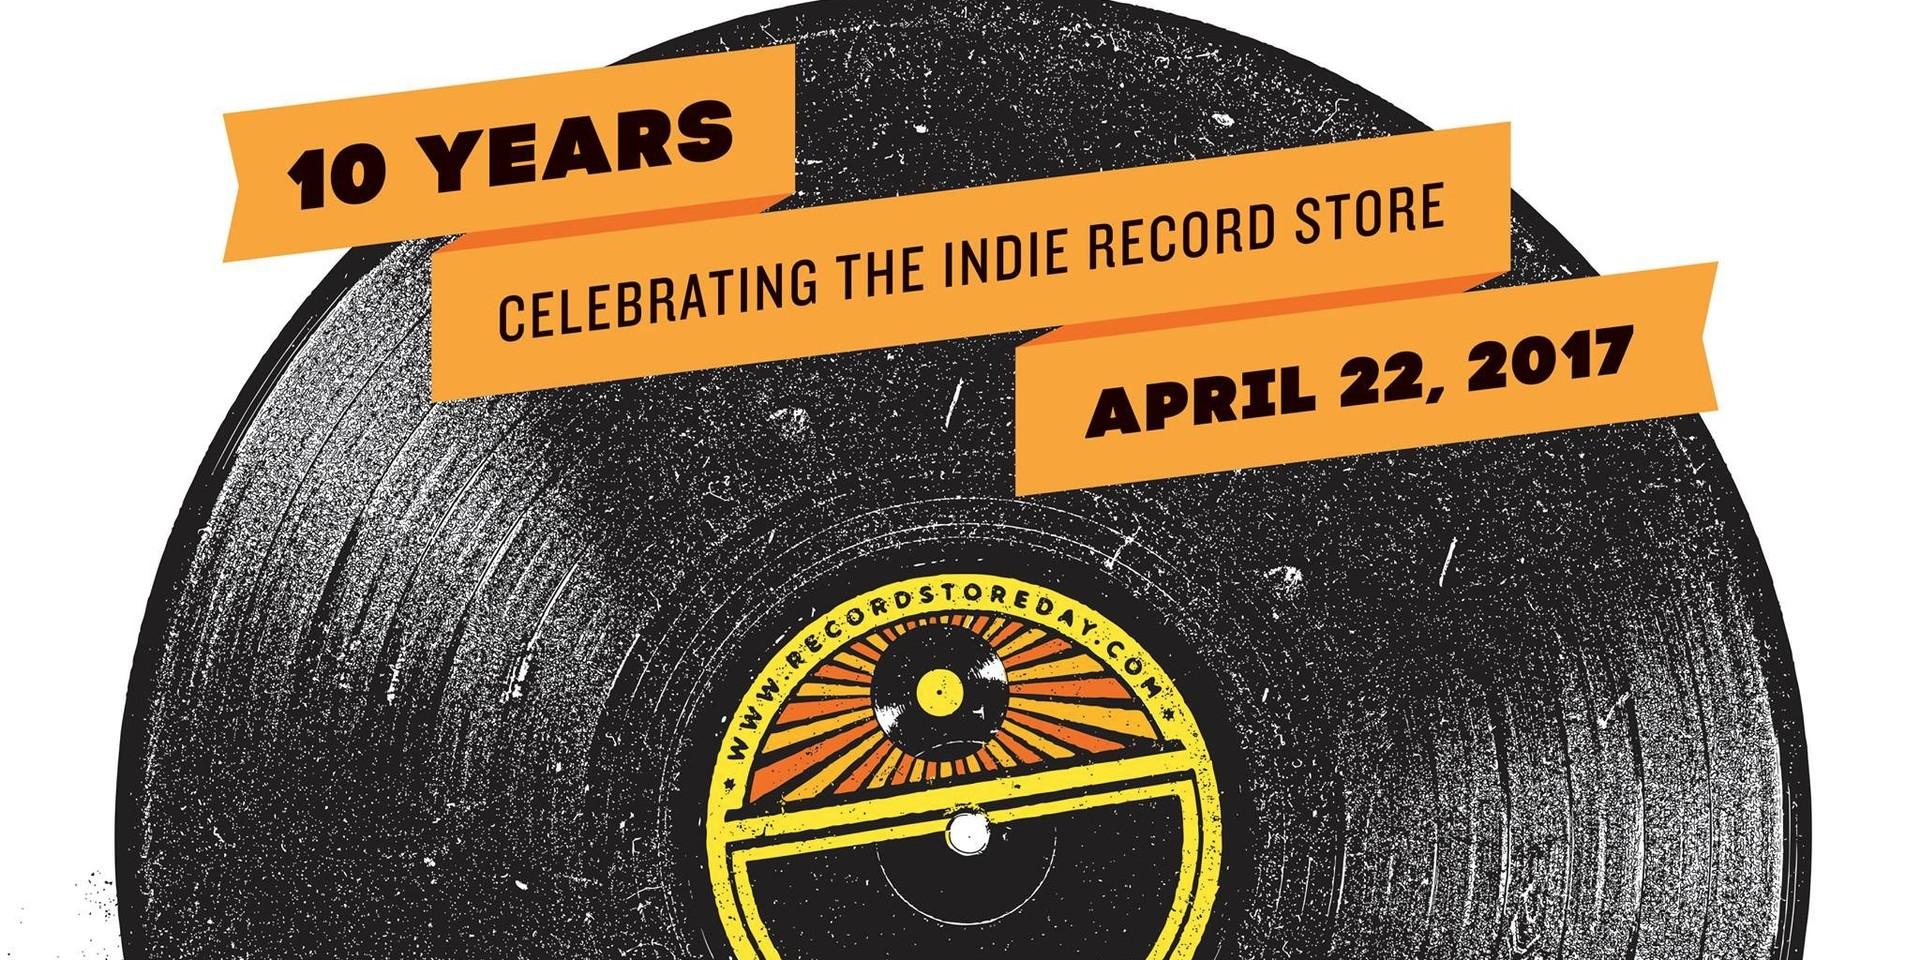 Audio Pilipinas celebrates 10 years of Record Store Day